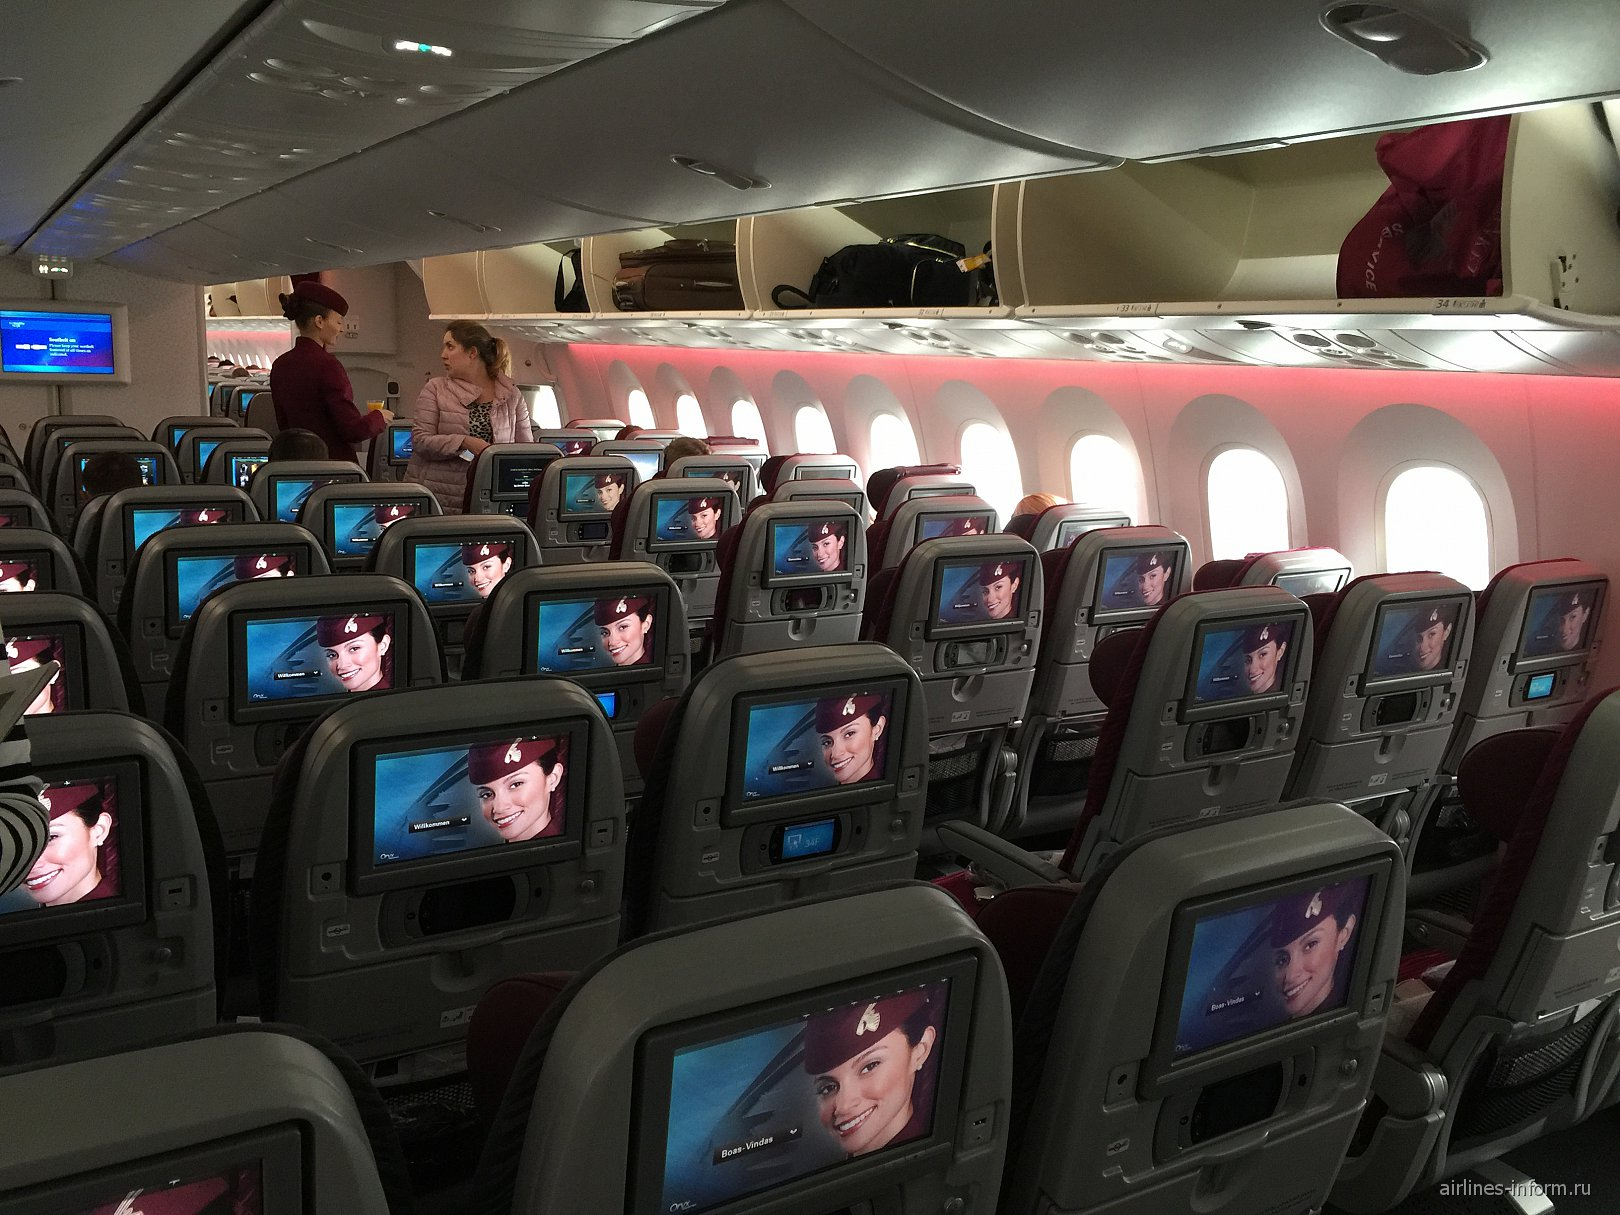 Салон эконом-класса в самолете Боинг-787-8 Катарских авиалиний